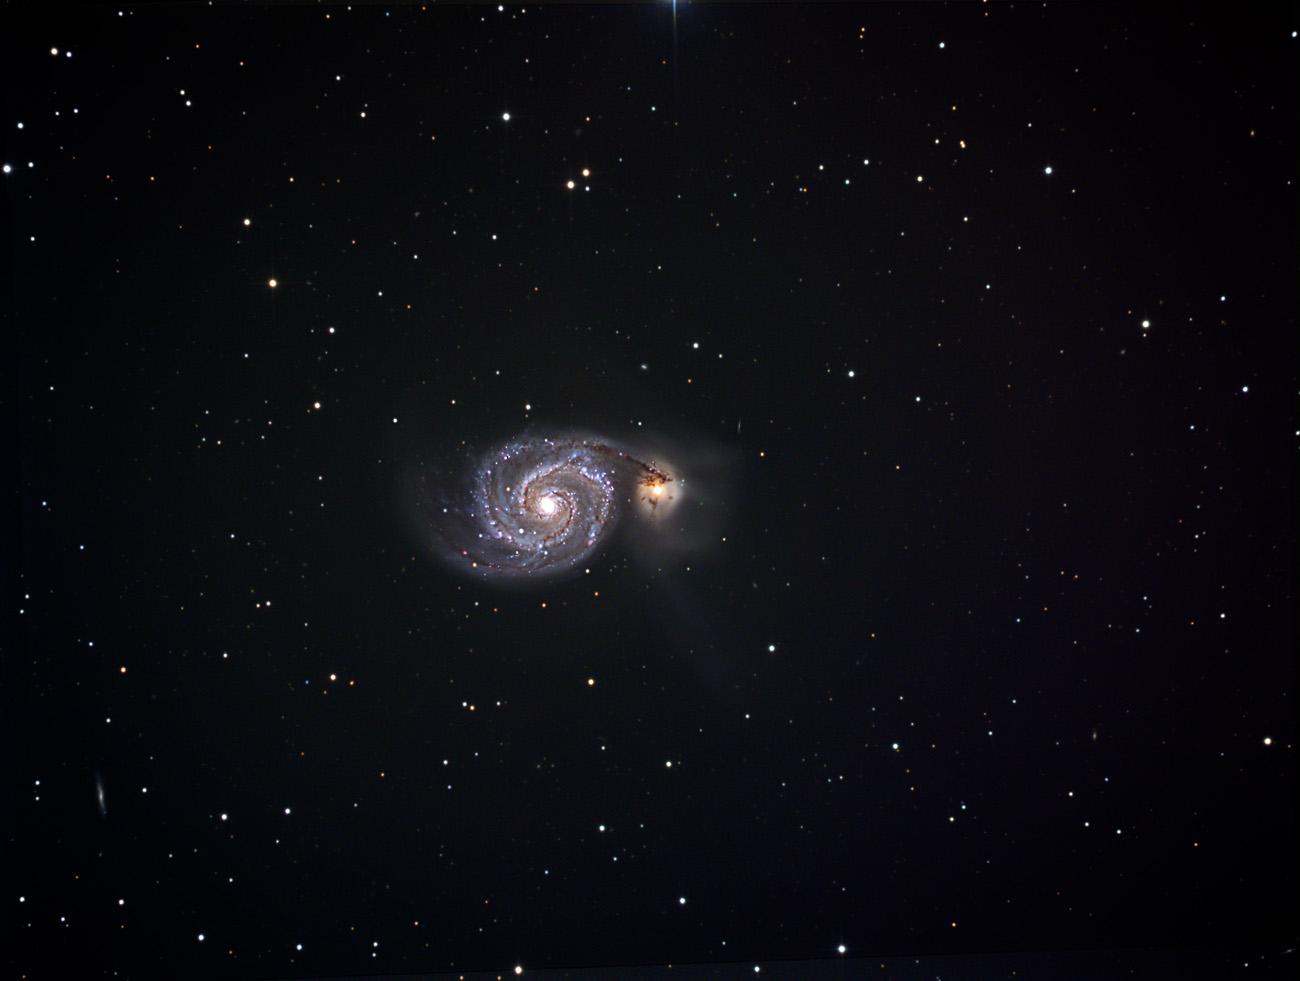 M51 Whirlpoolgalaxie